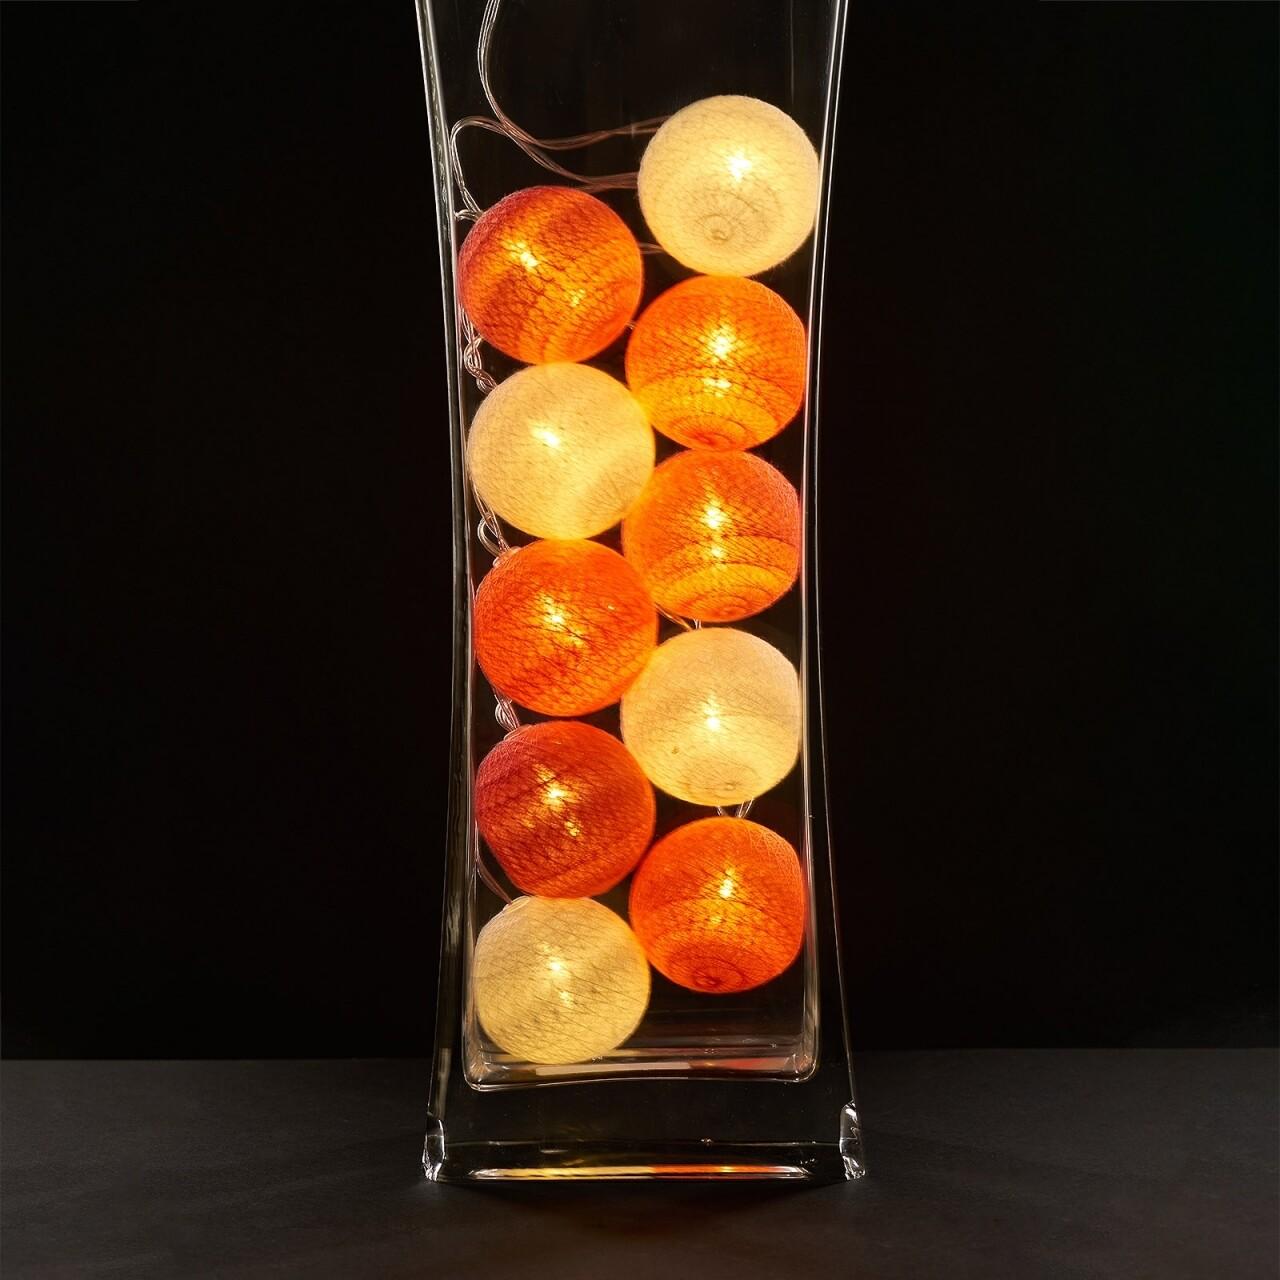 Ghirlanda luminoasa cu 10 LED-uri Orange, Heinner Home, 180 cm, plastic, roz/portocaliu